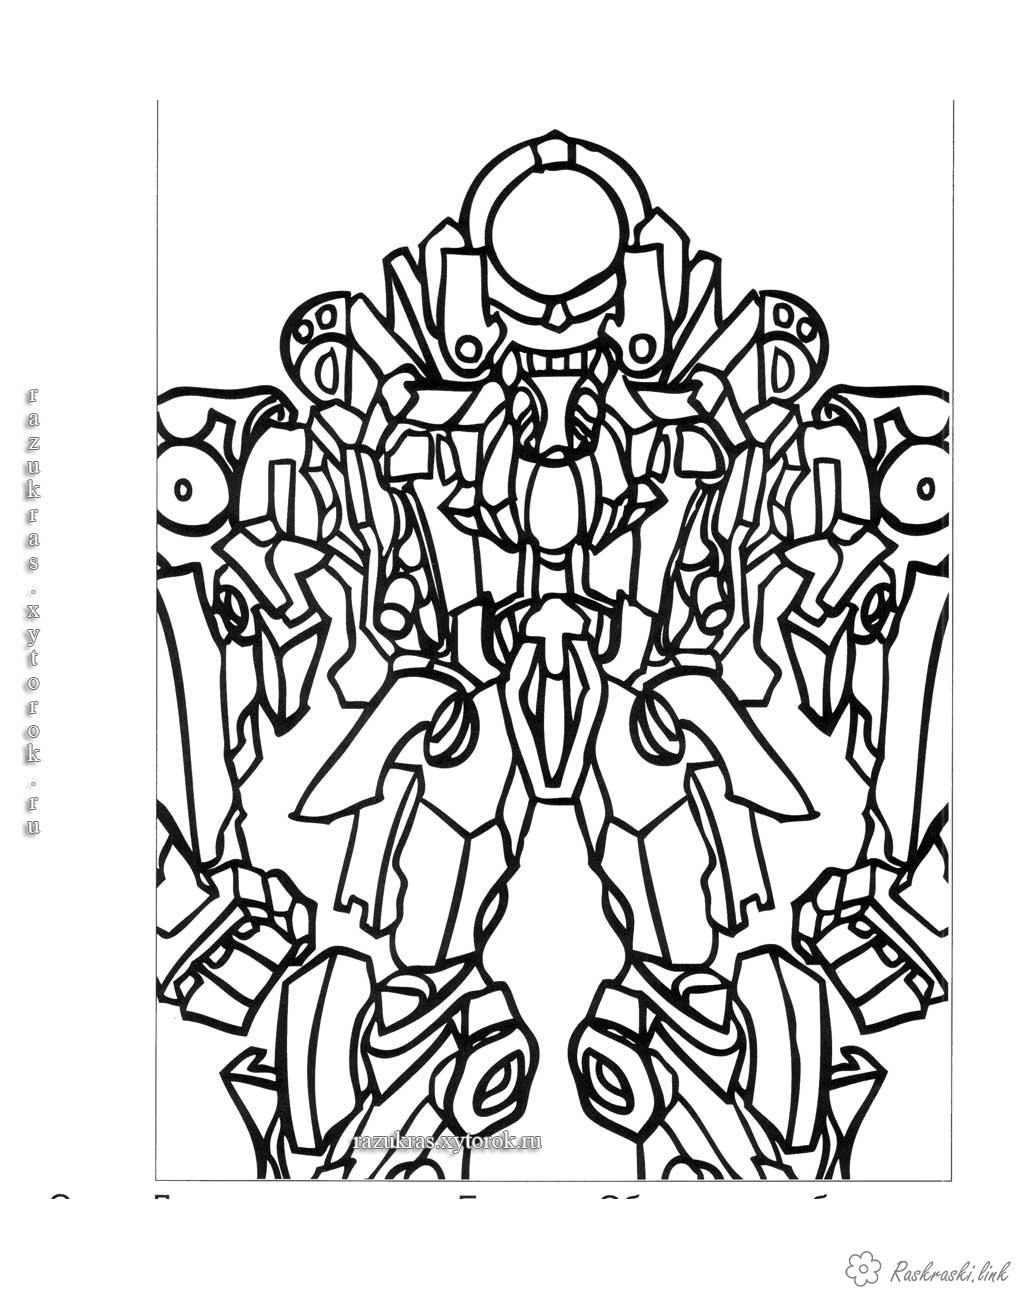 Розмальовки Роботи кіборги трансформери трансформер